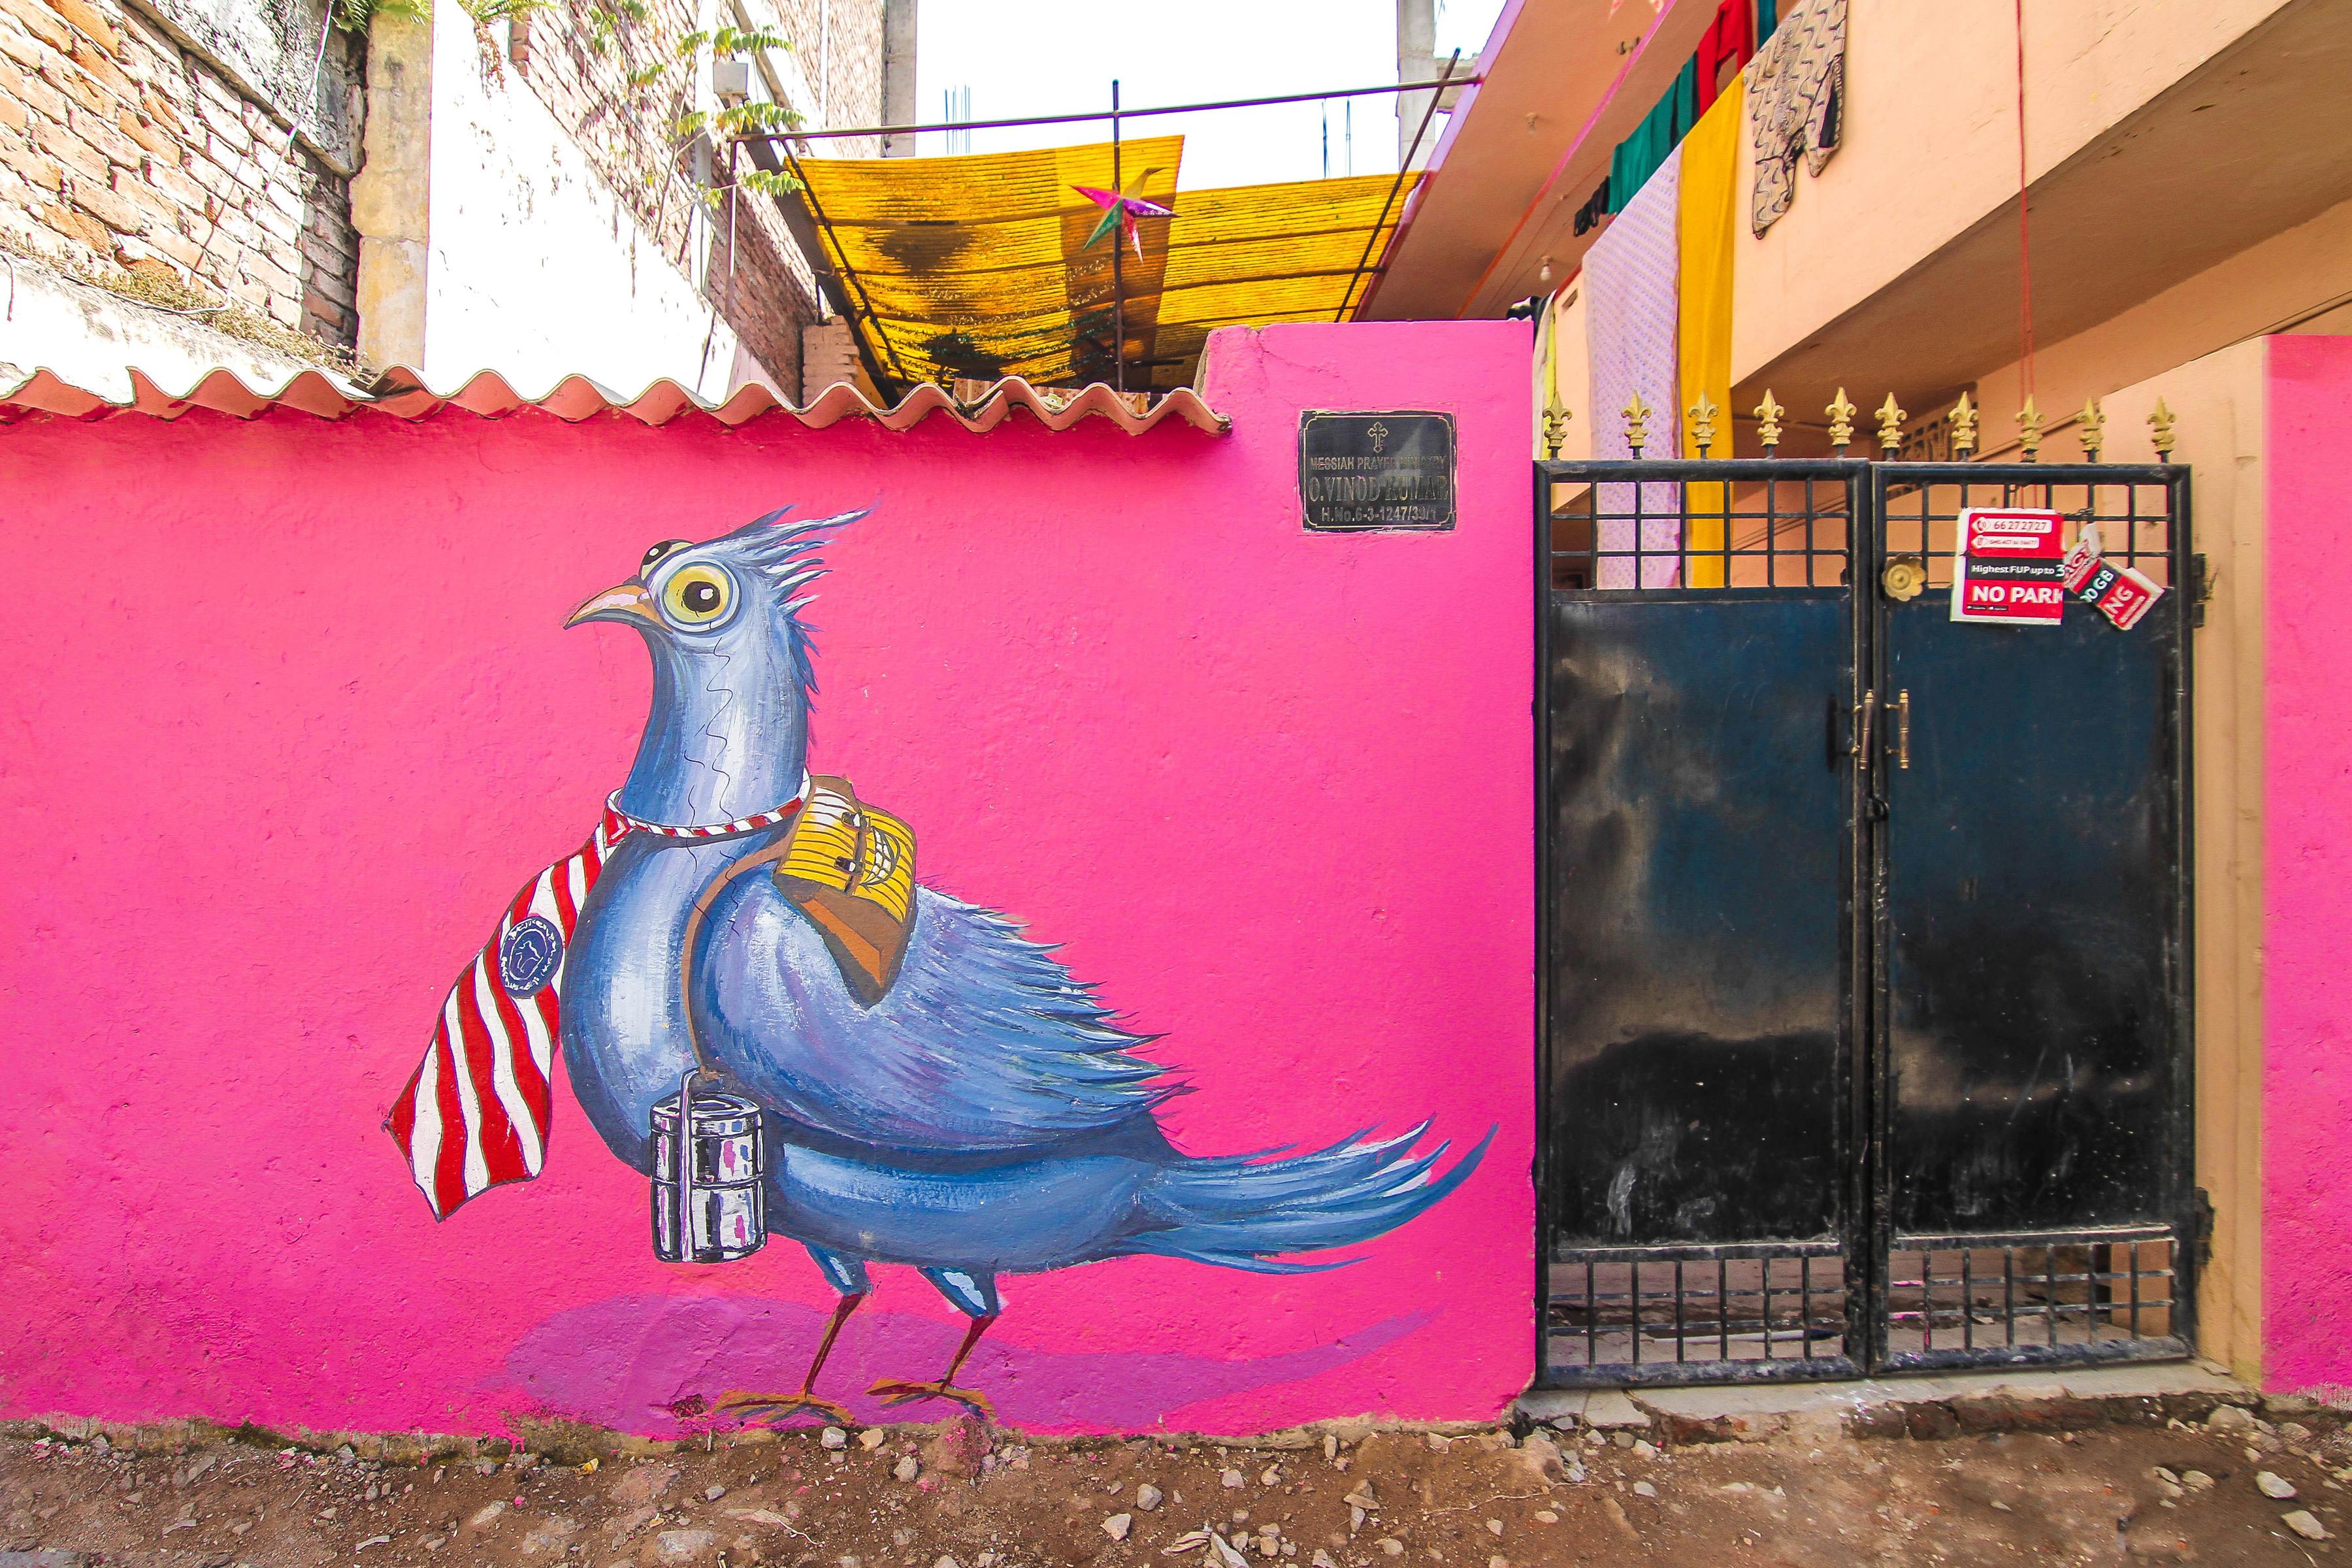 Shiva Rangaa Pink Lane Maqta Art District 2018 Reveals Pranav Gohil